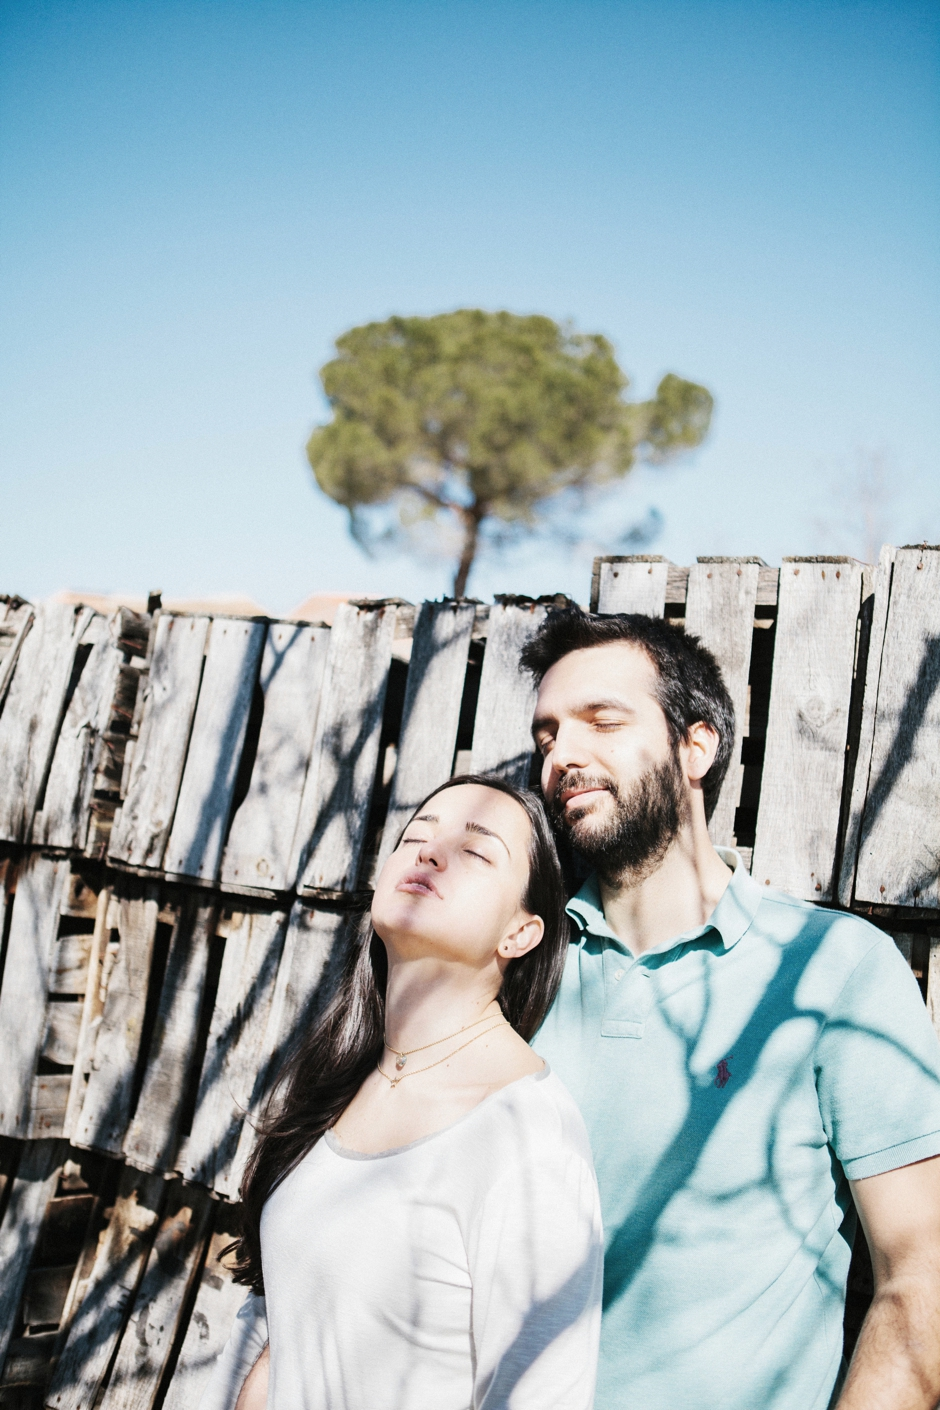 fotografo-de-boda-valencia-sevilla-mallorca-jose-caballero-bodafilms-3.jpg